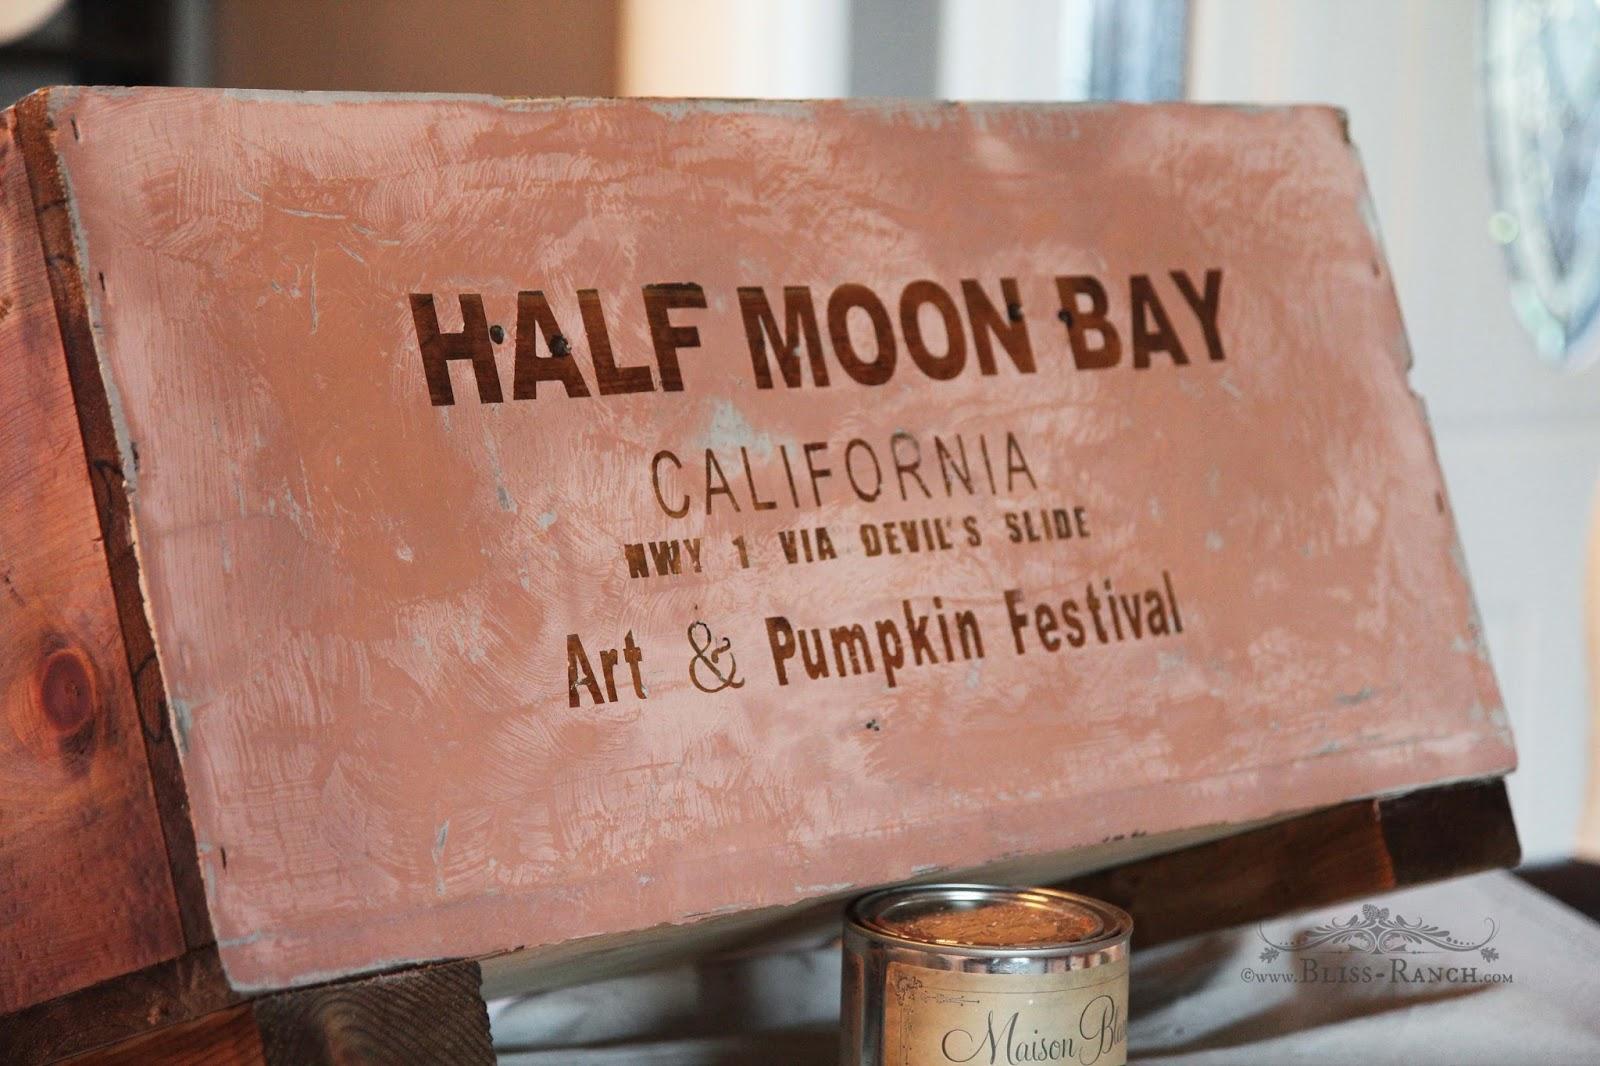 Half Moon Bay Crate Bliss-Ranch.com